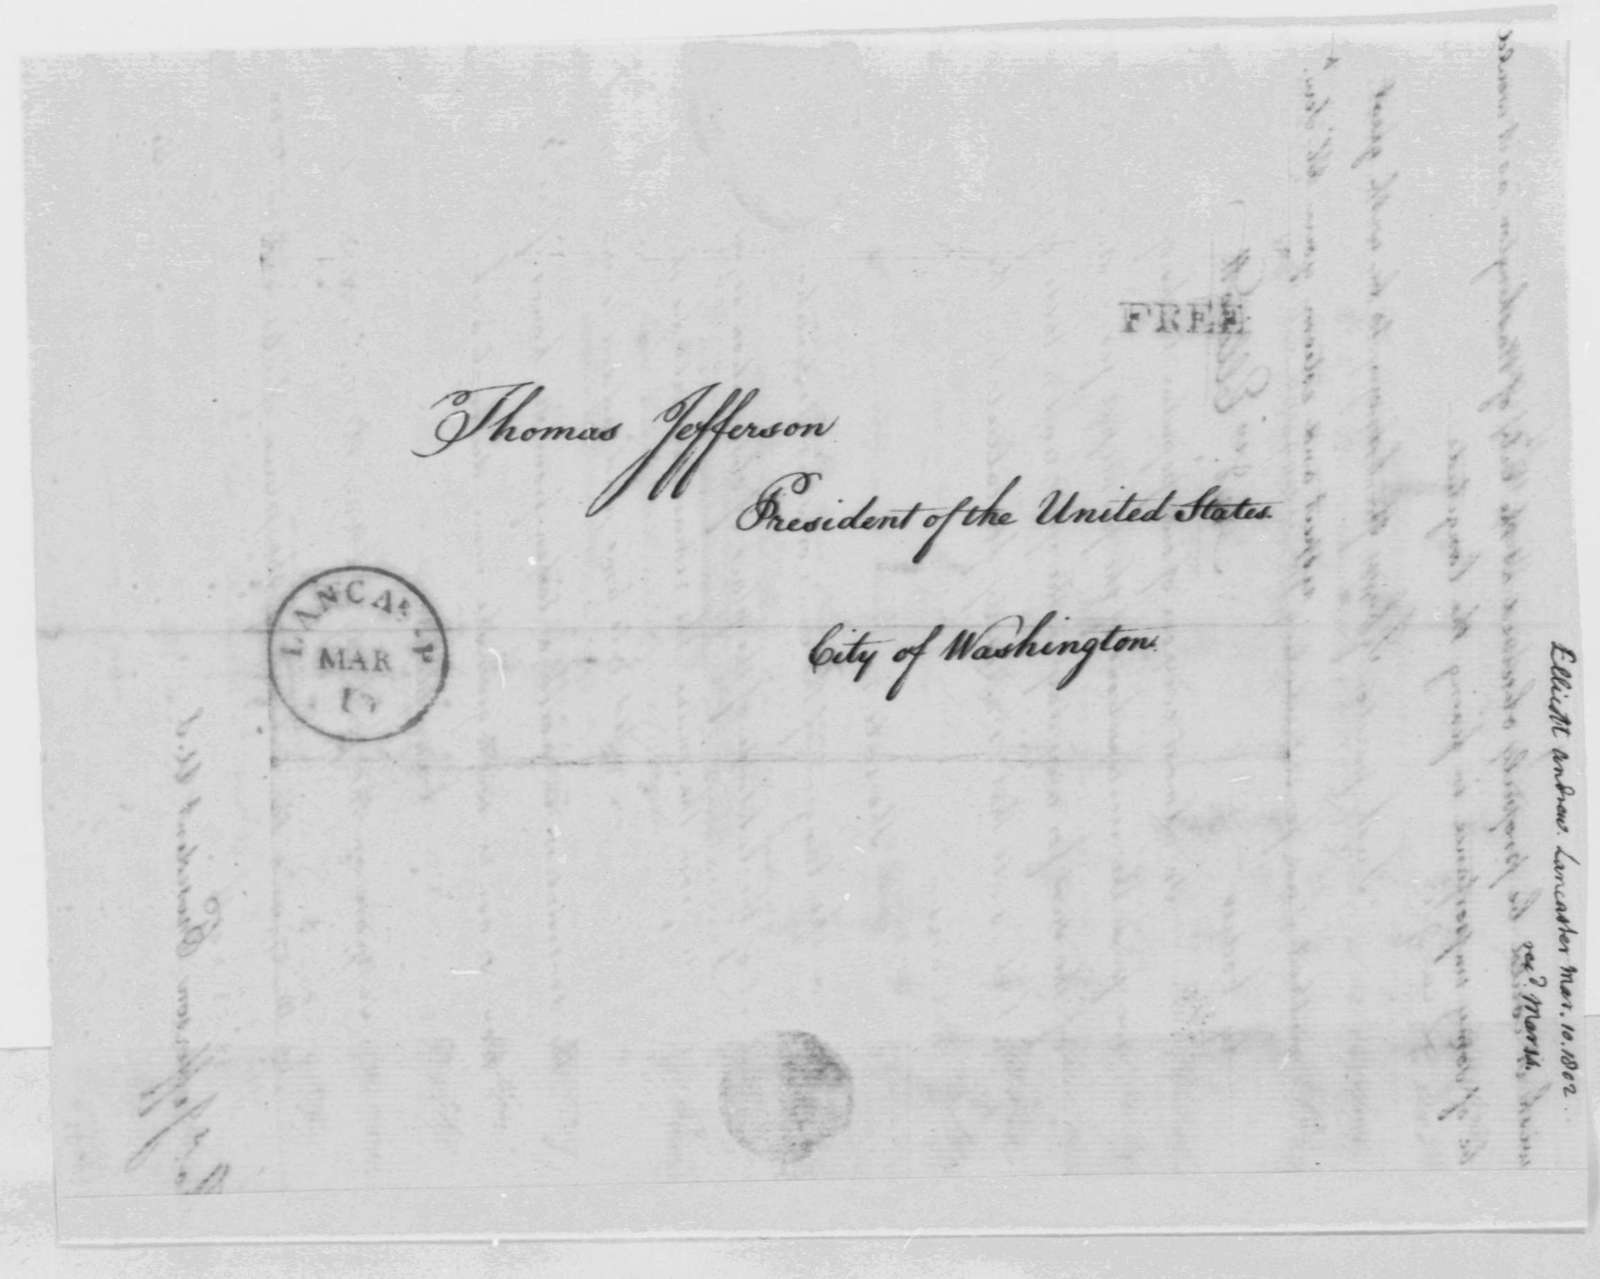 Andrew Ellicott to Thomas Jefferson, March 19, 1802